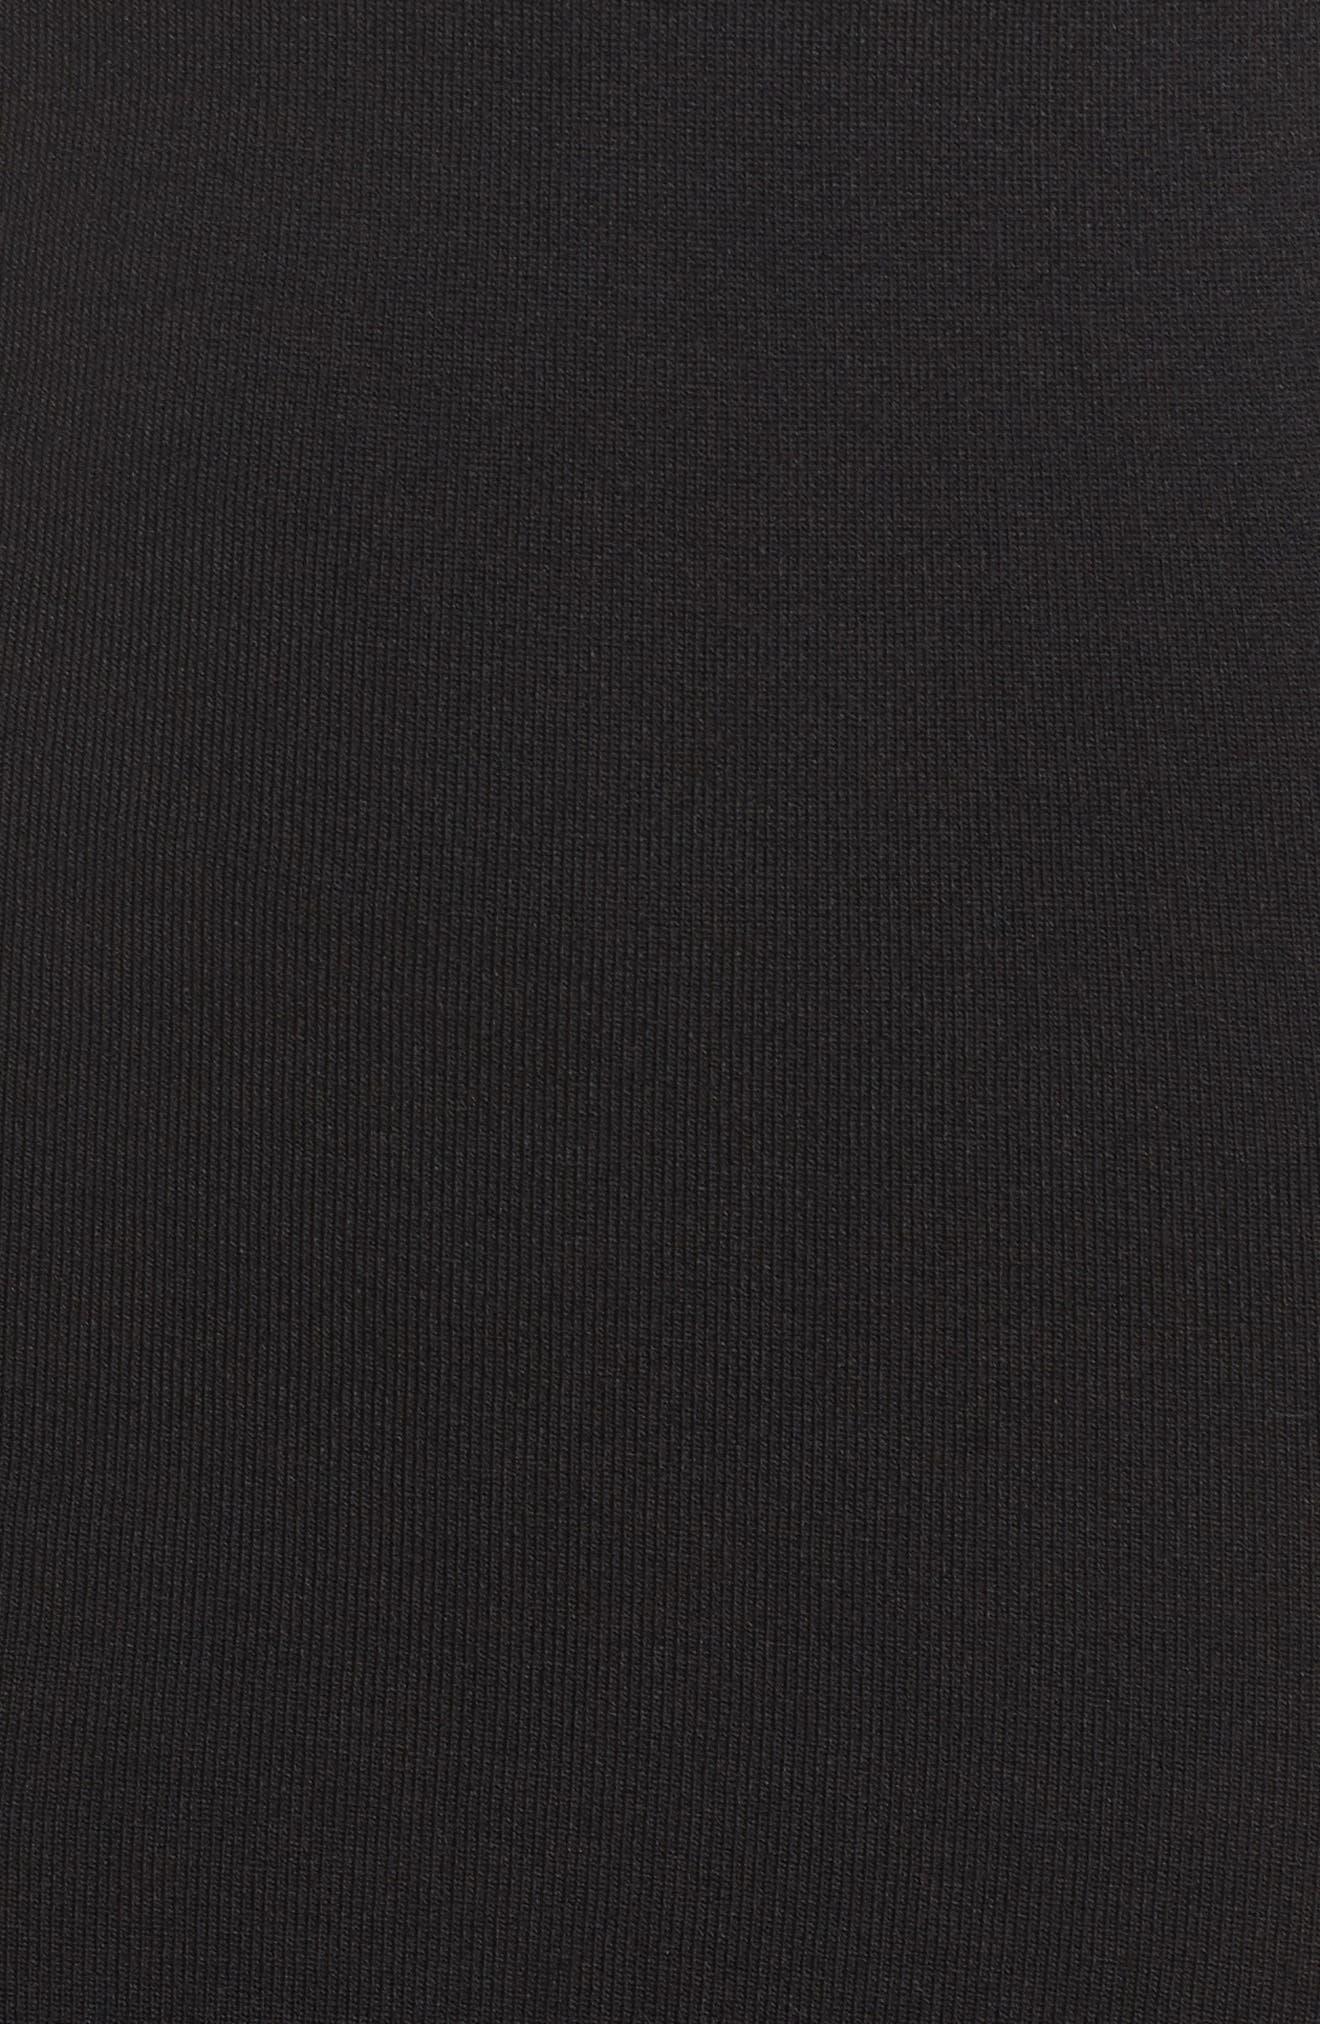 Head Over Heals Sheath Dress,                             Alternate thumbnail 5, color,                             Black